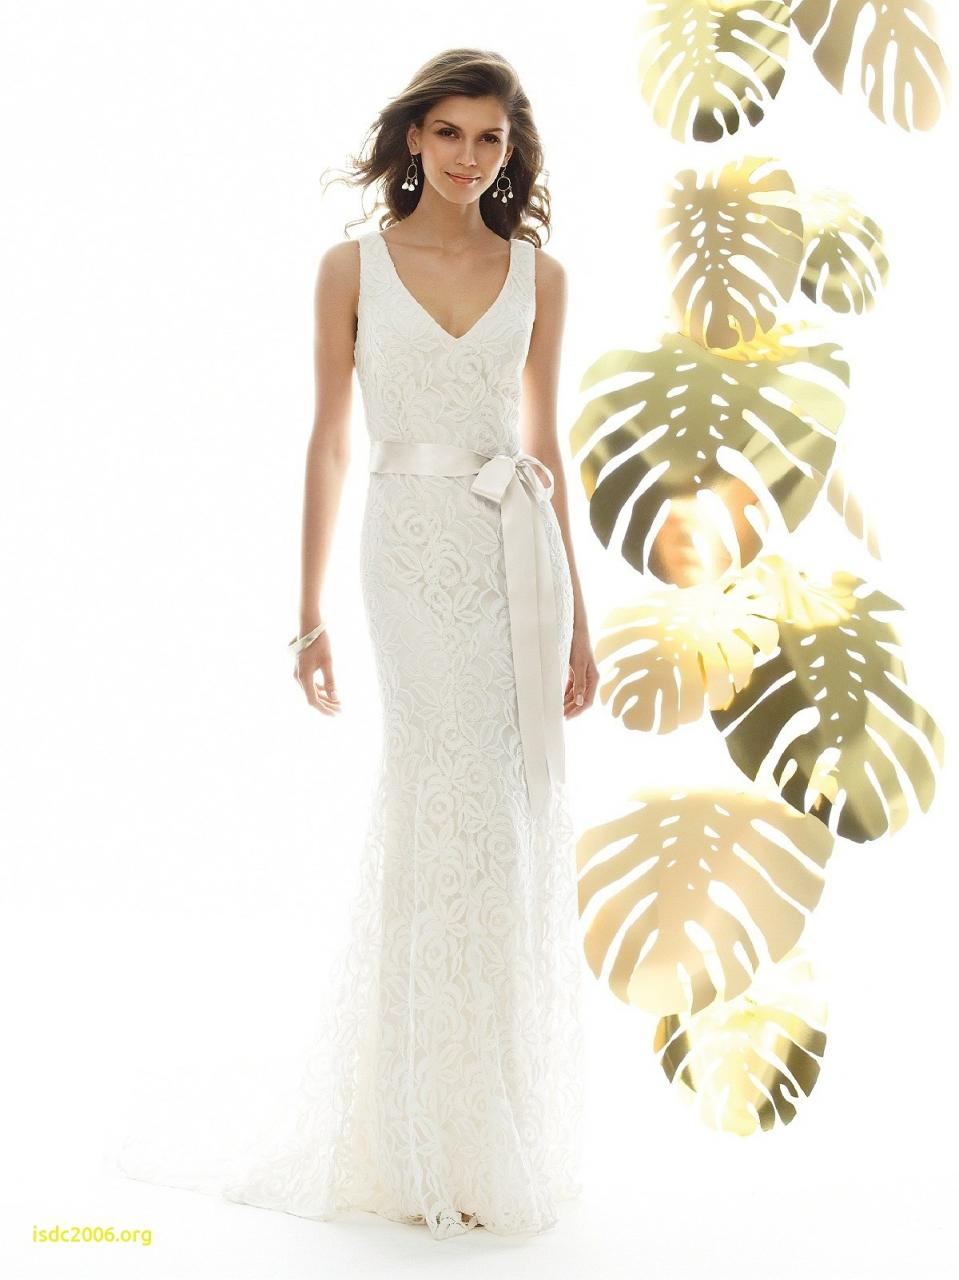 Plus Size Beach Wedding Dresses 2013 Wedding Dresses For Women Over